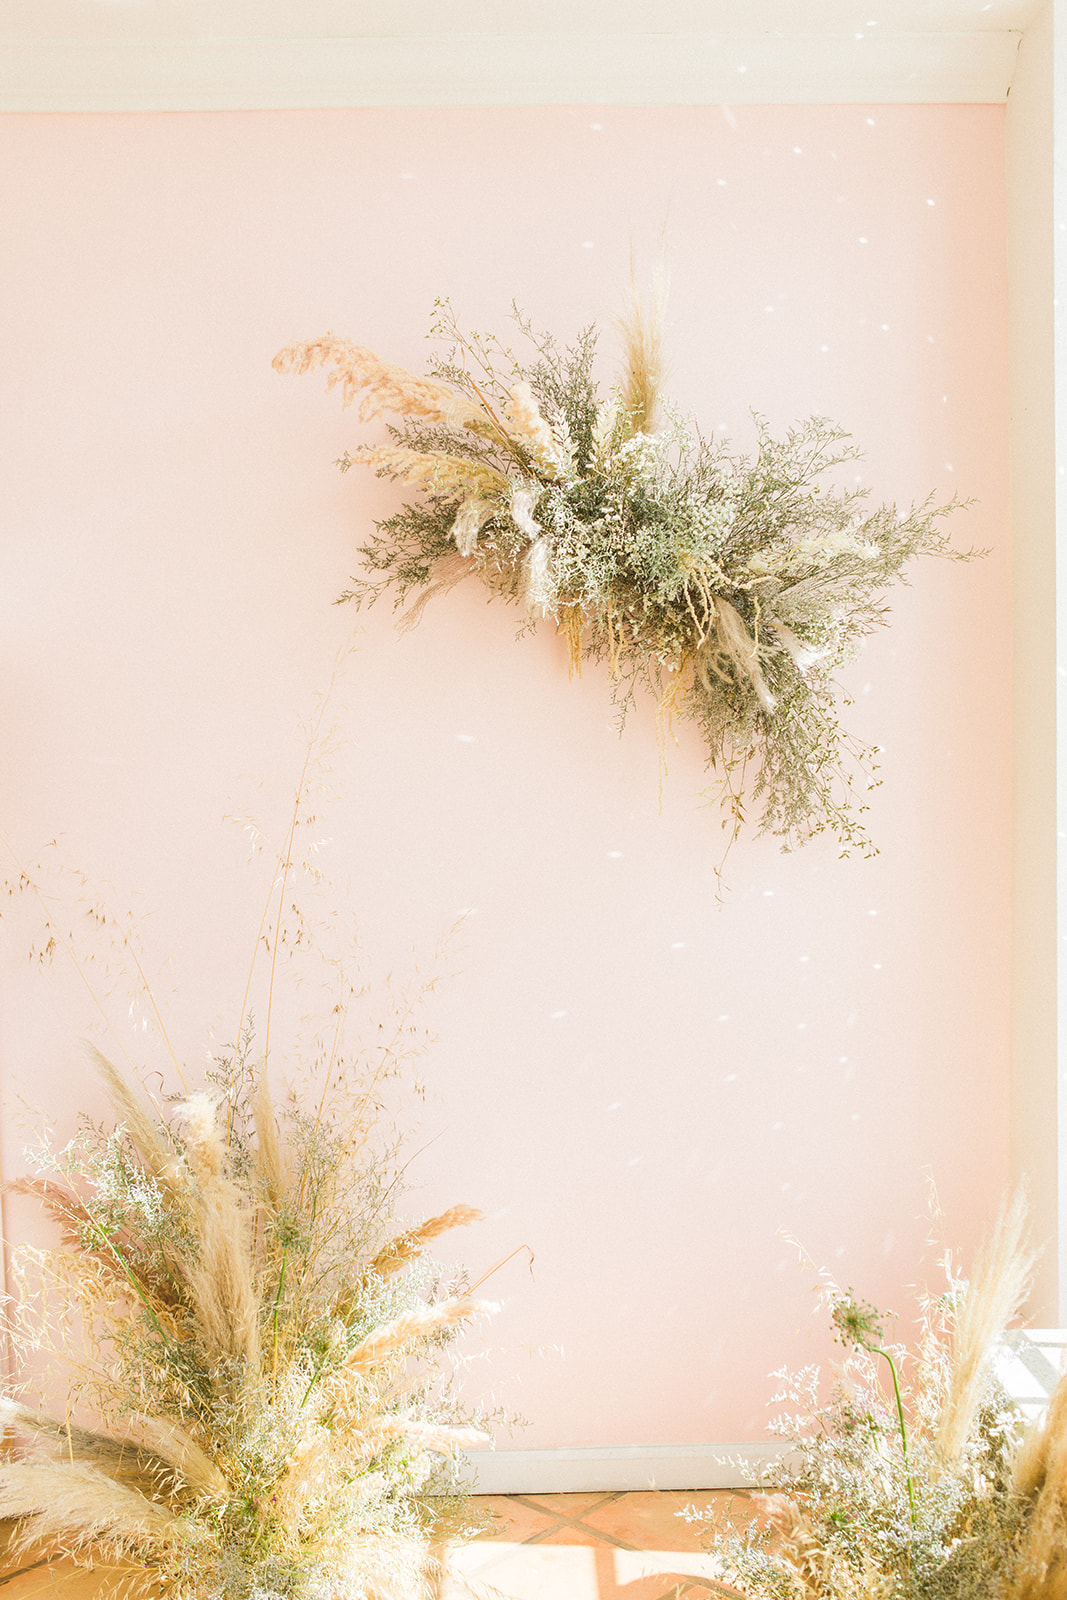 Sarah_Ellefson_Photography-2.jpg